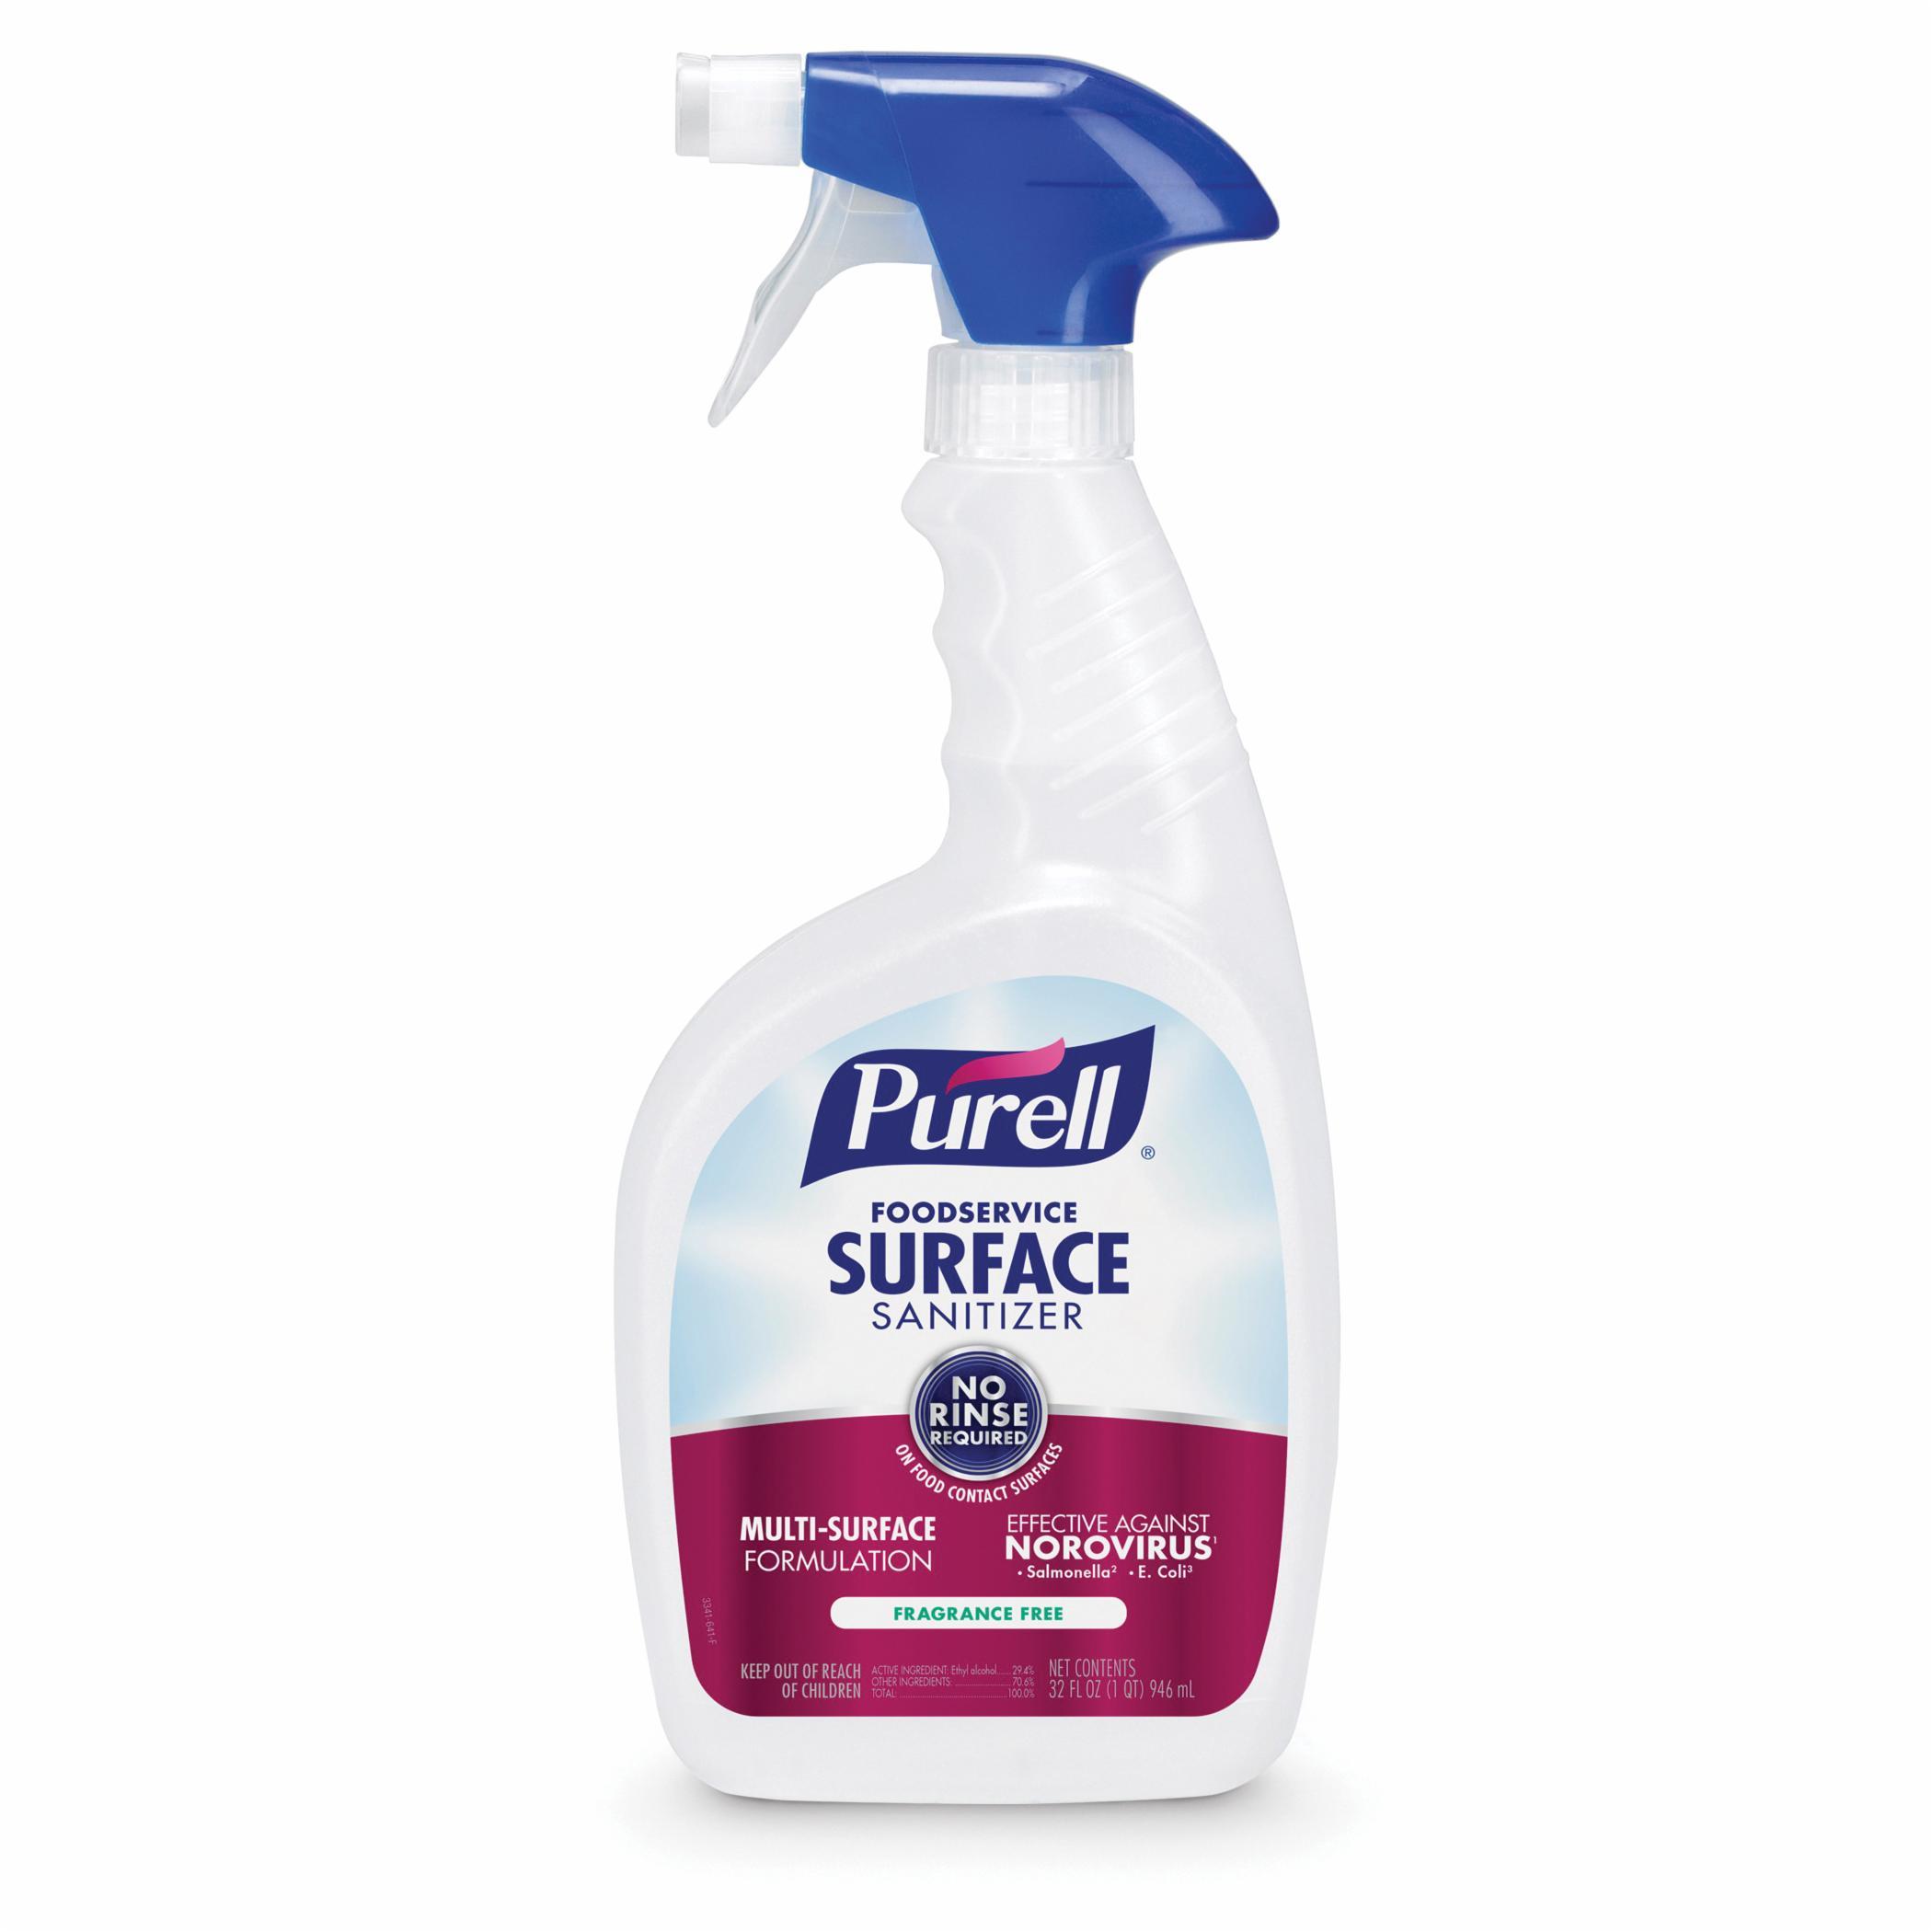 PURELL® 3341-03 Surface Sanitizer, 32 fl-oz Spray Bottle, 12.6 to 12.9, Liquid, Fragrance Free